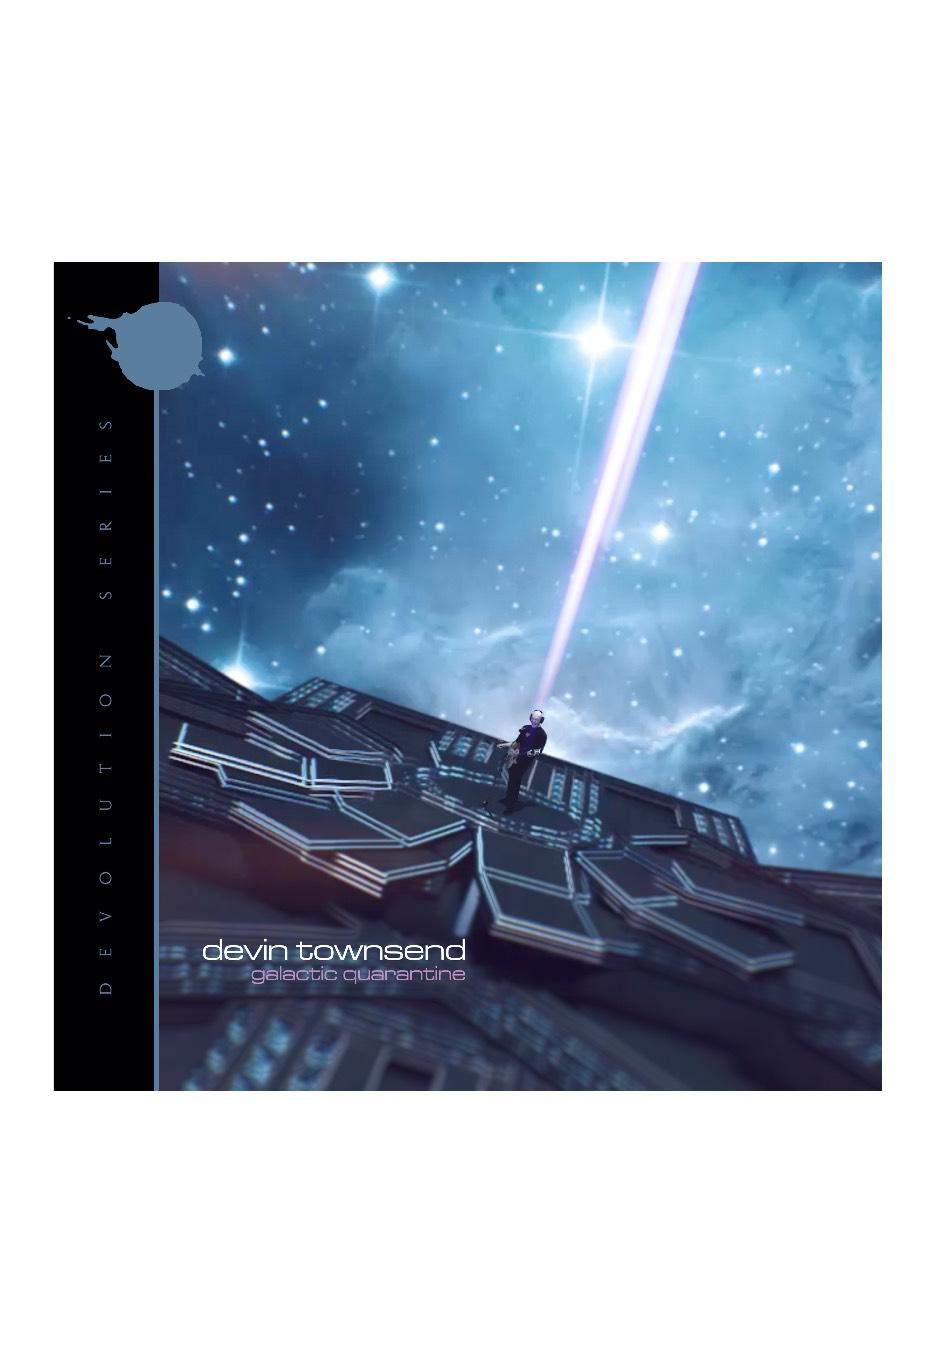 Devin Townsend - Devolution Series #2 - Galactic Quarantine Ltd. - CD